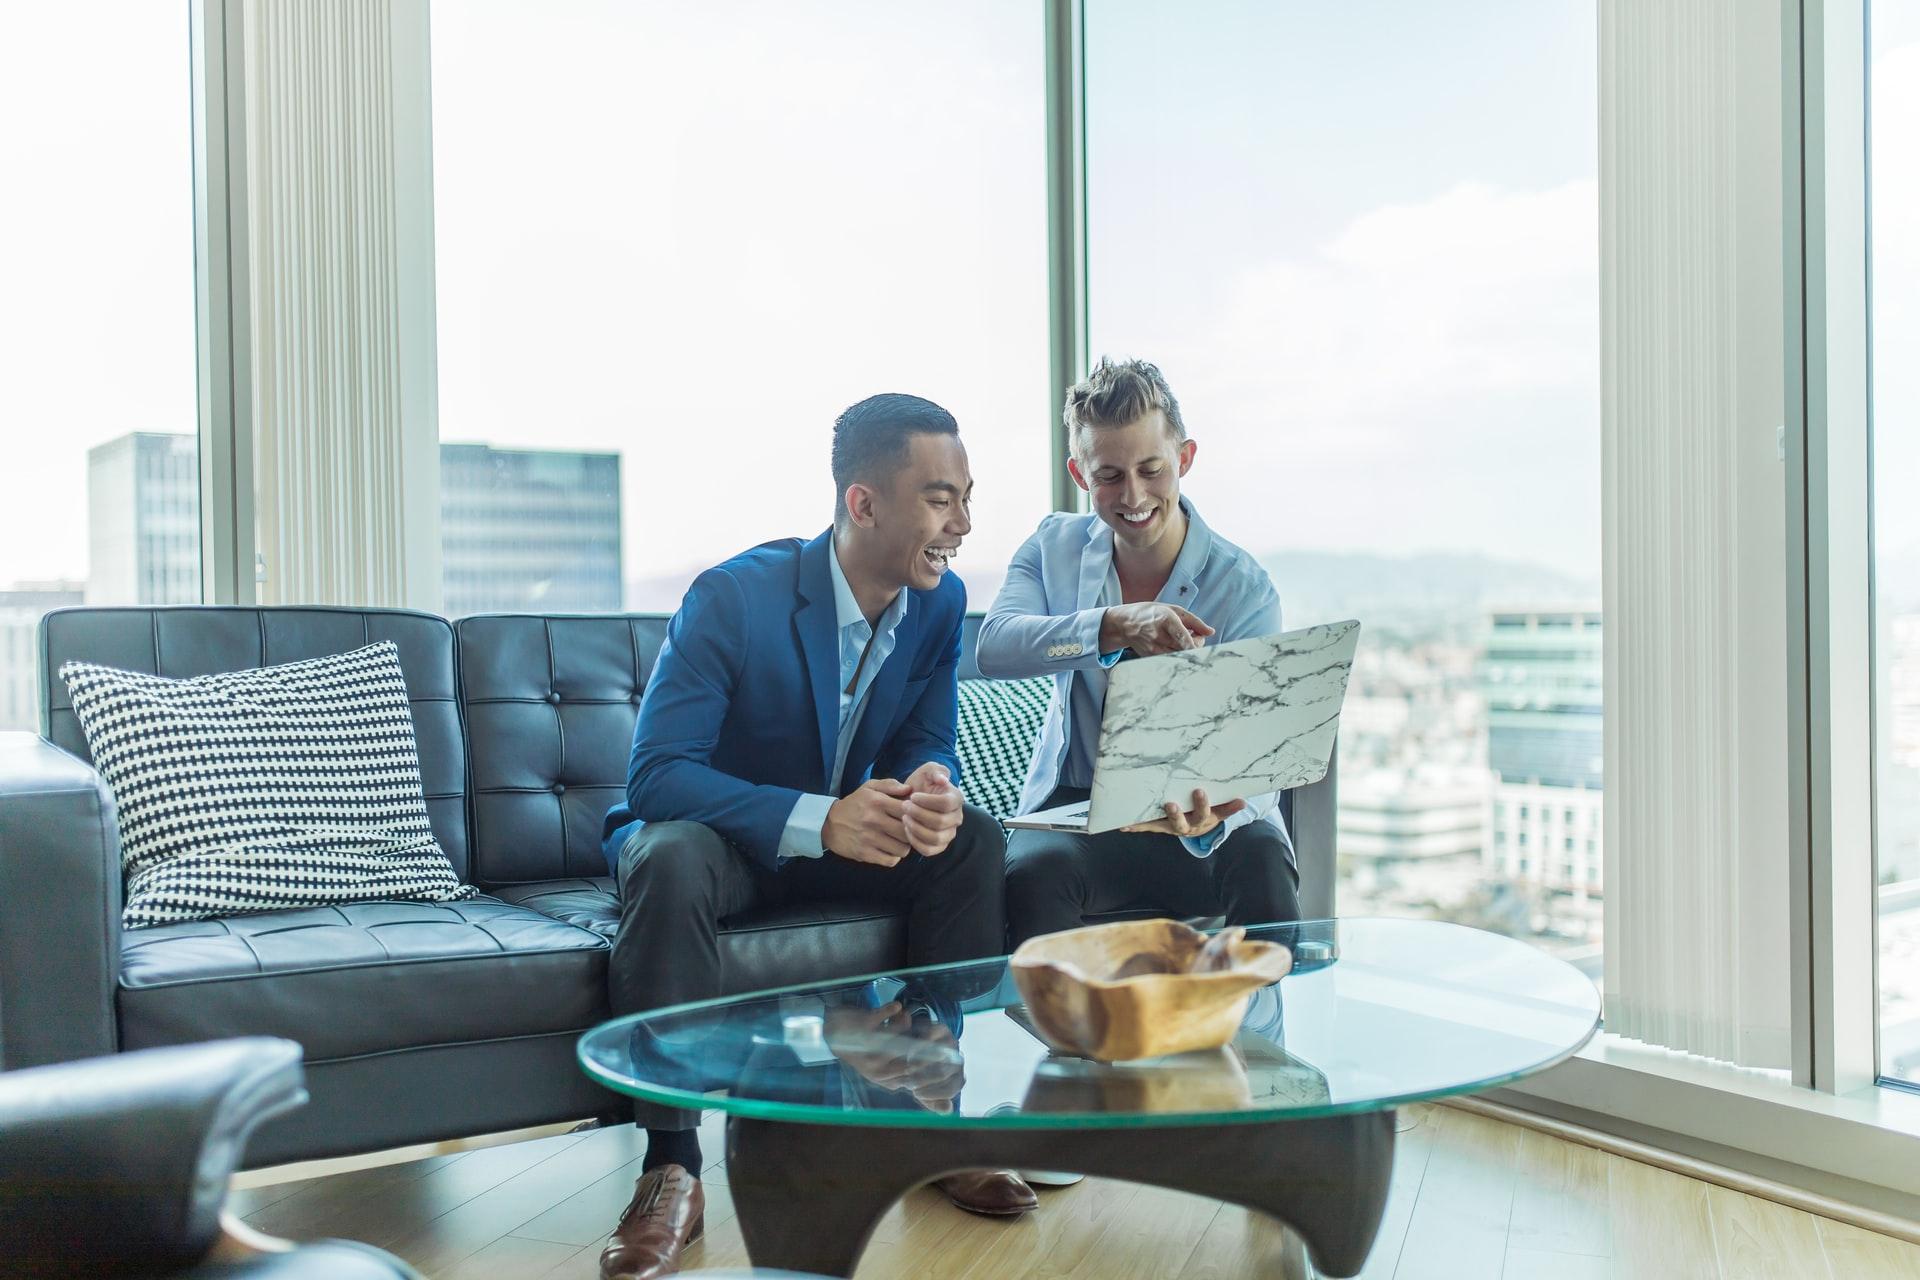 Should You Consider Investing in Markel Corporation (MKL)?